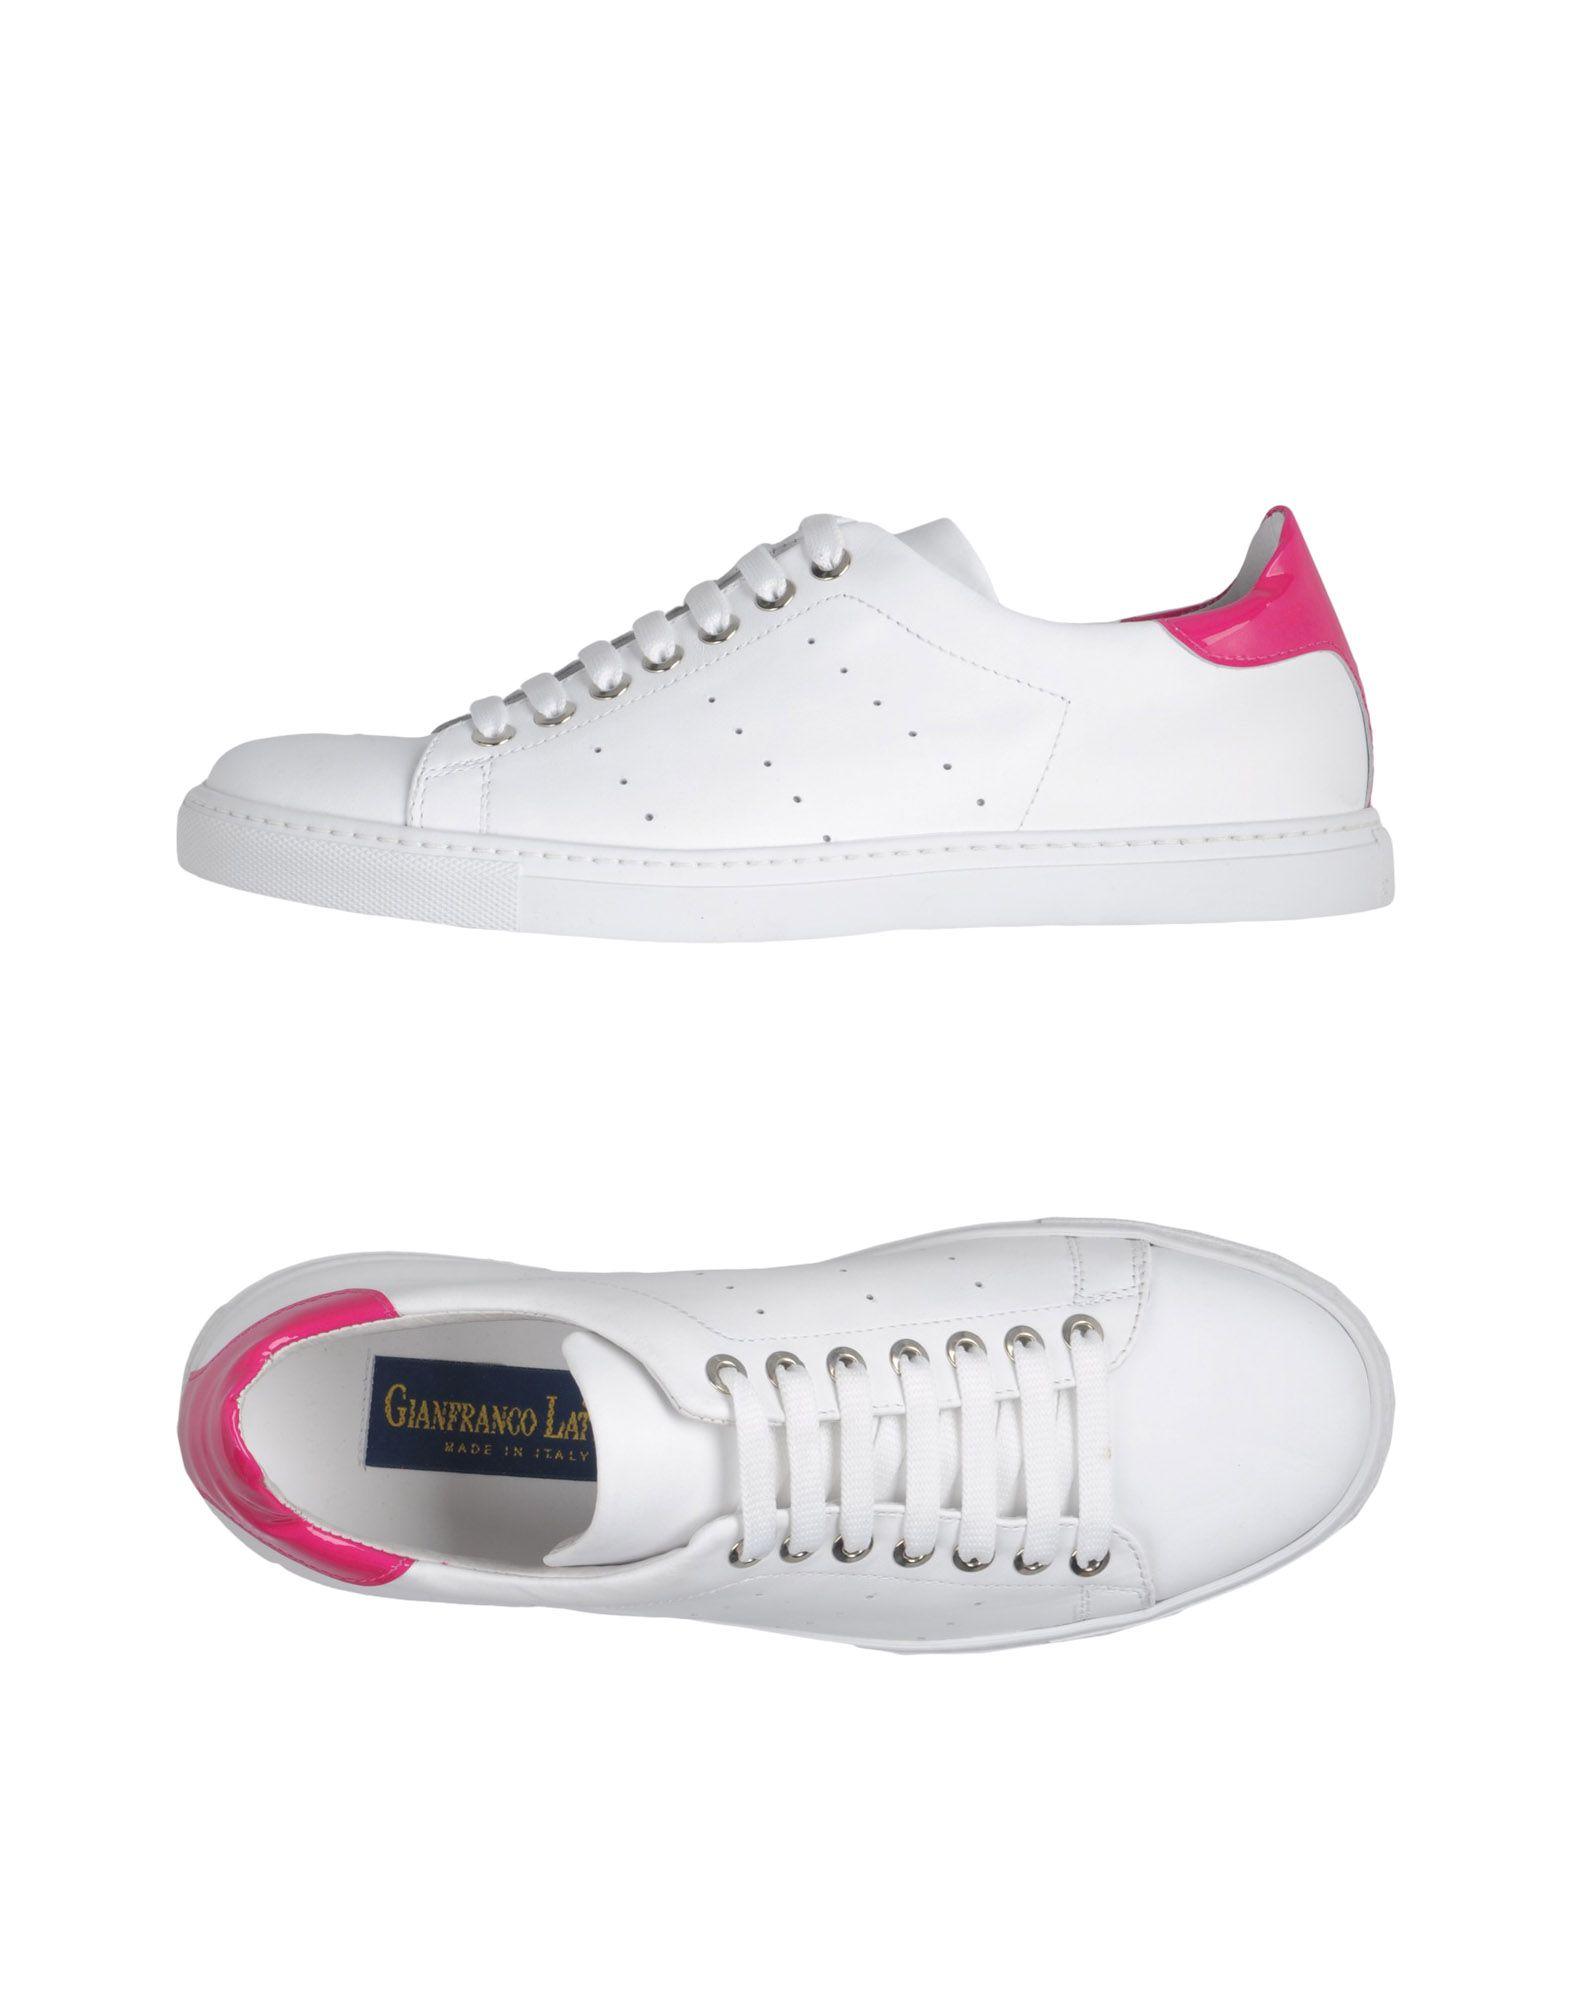 Gianfranco Lattanzi Sneakers Damen  11386400GI Gute Qualität beliebte Schuhe